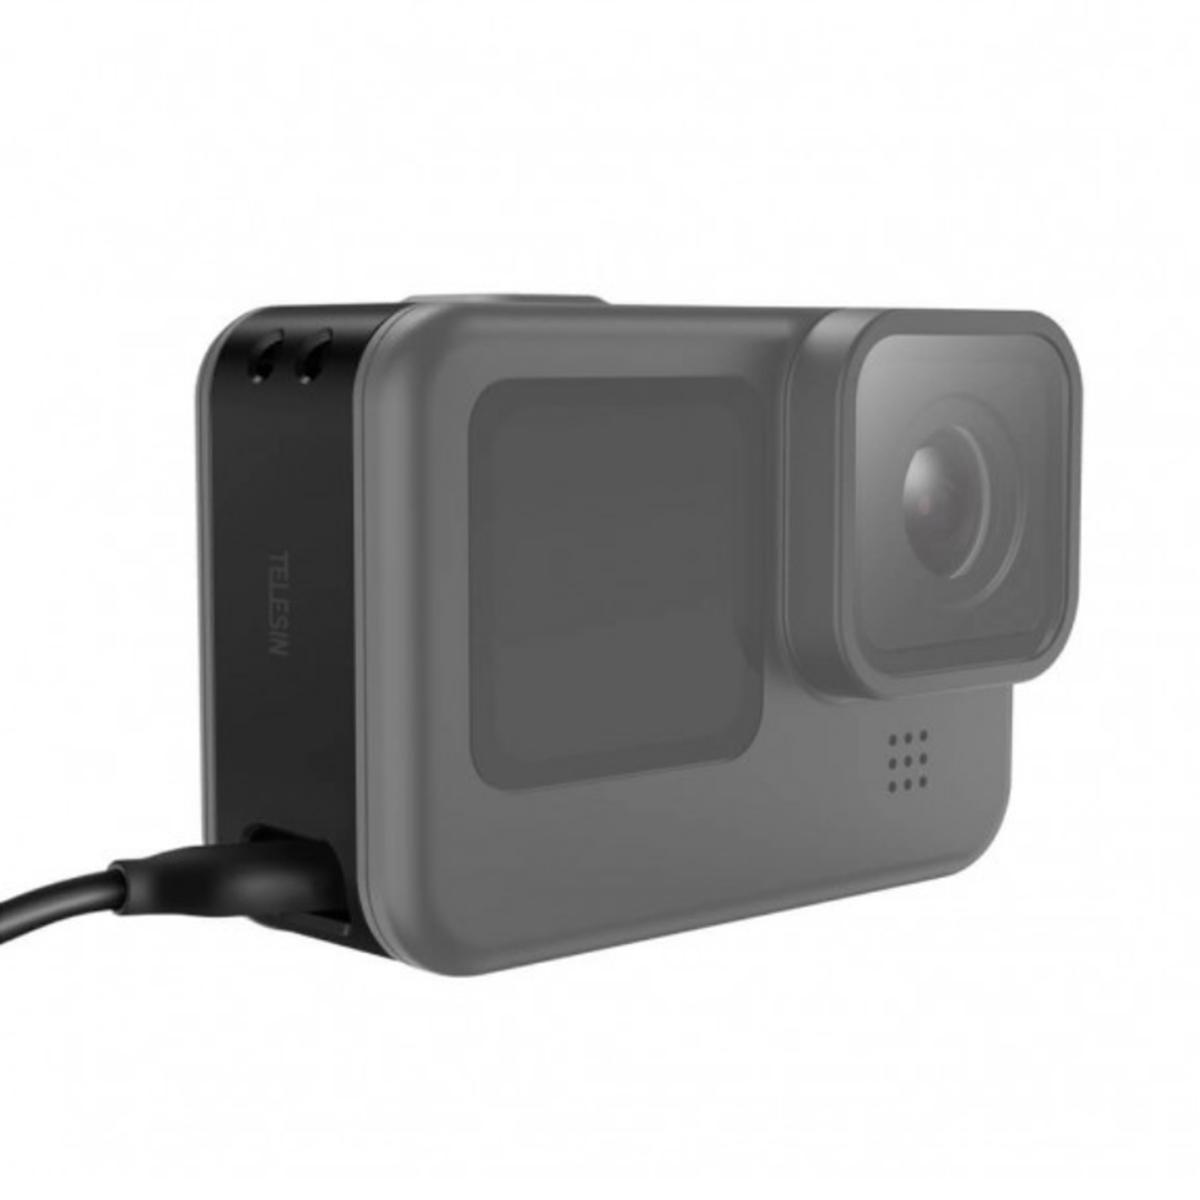 Tampa Lateral para GoPro Hero9 Black com Abertura pra Carregamento - Telesin